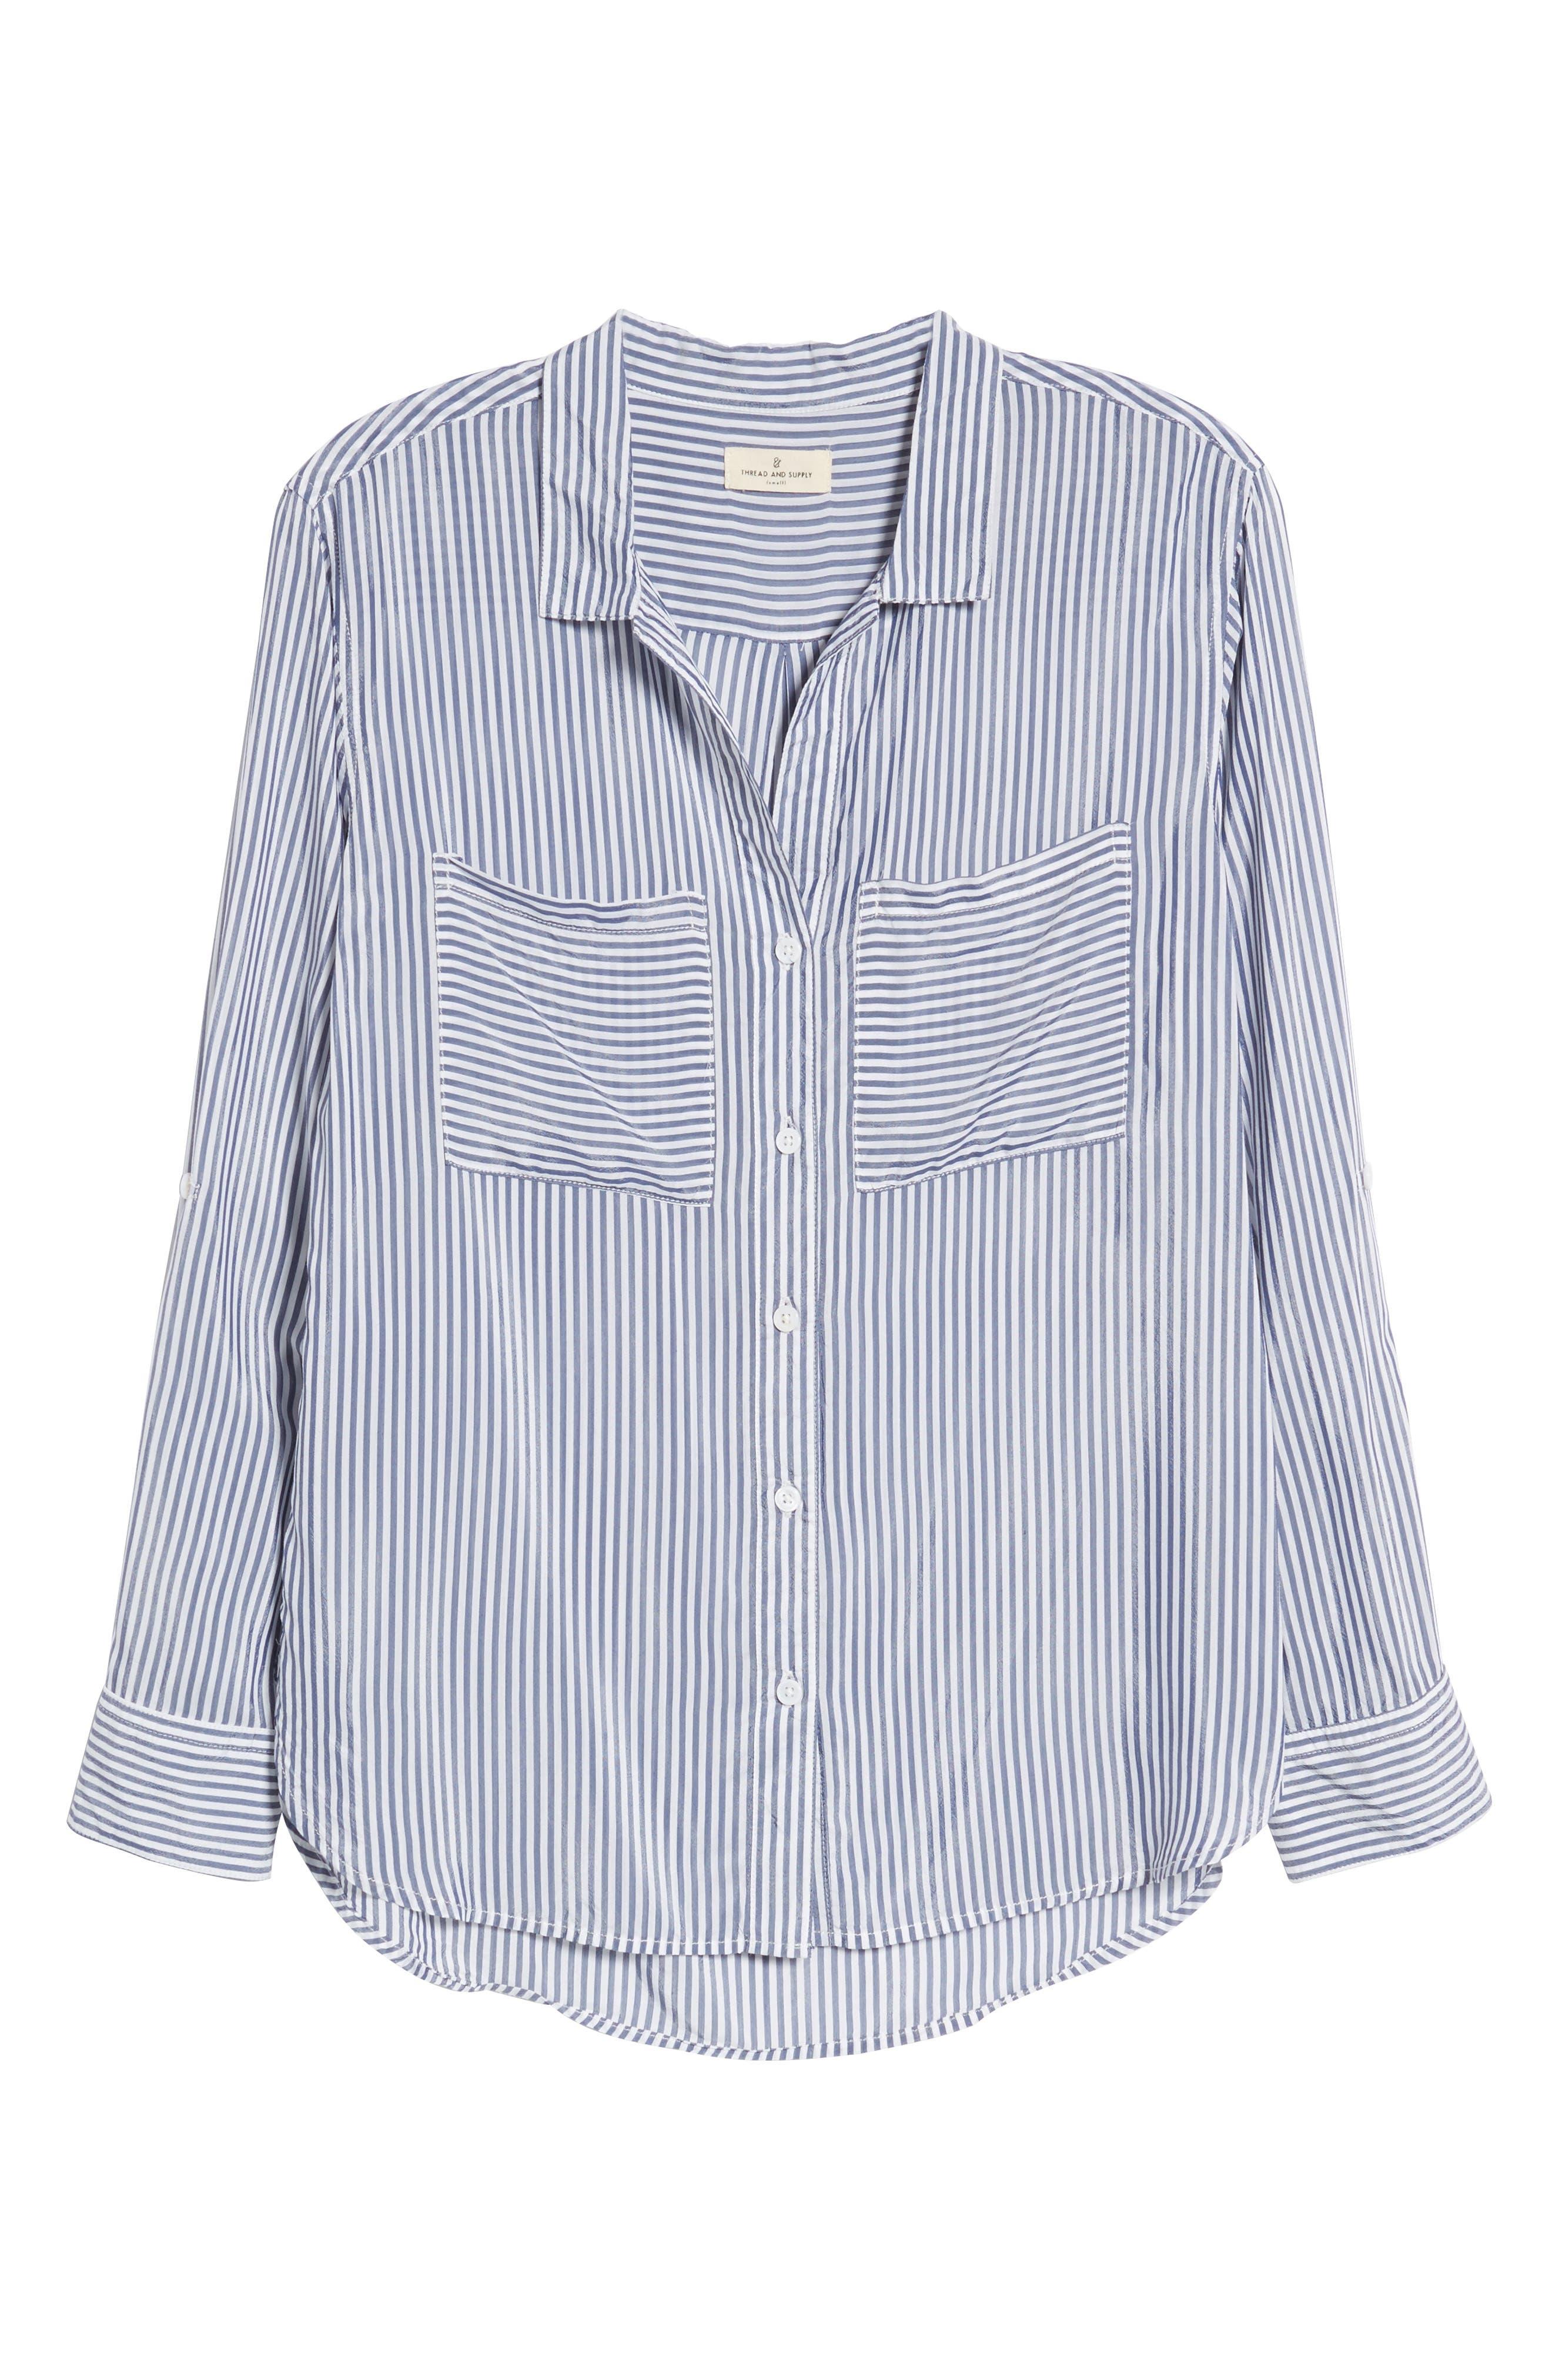 Zinc Stripe Shirt,                             Alternate thumbnail 7, color,